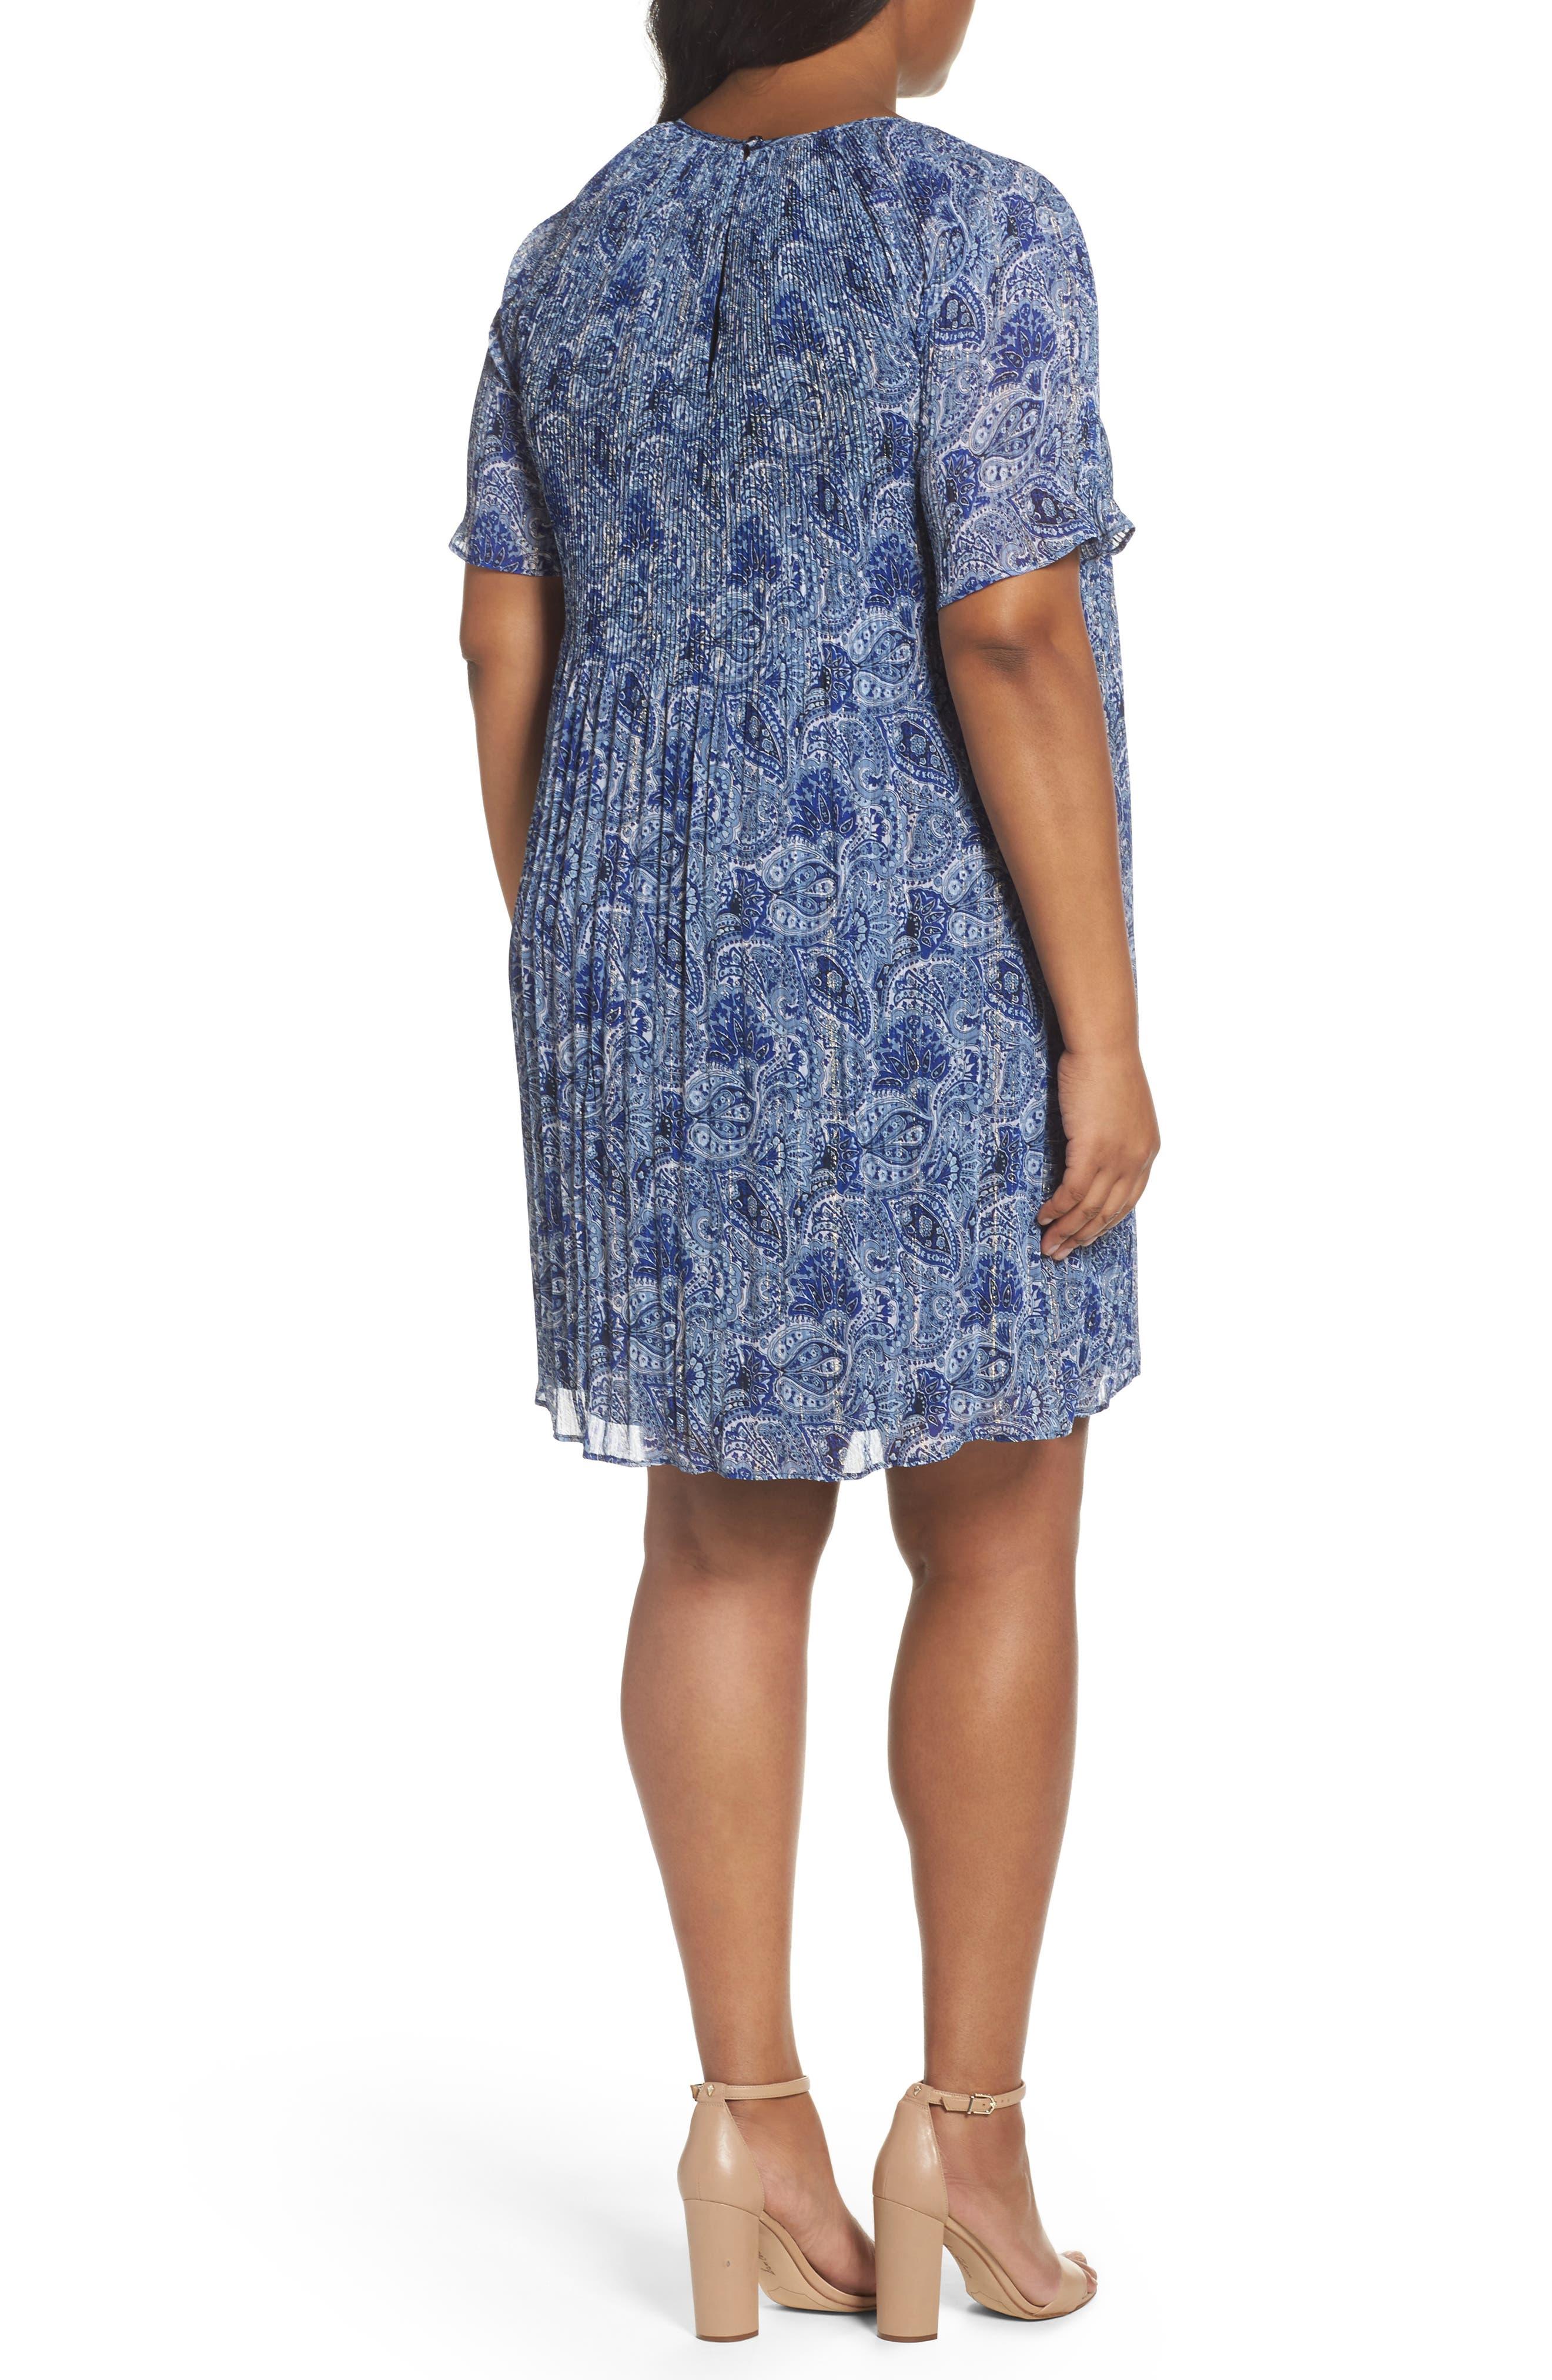 Kinley Pleat Shift Dress,                             Alternate thumbnail 2, color,                             True Navy